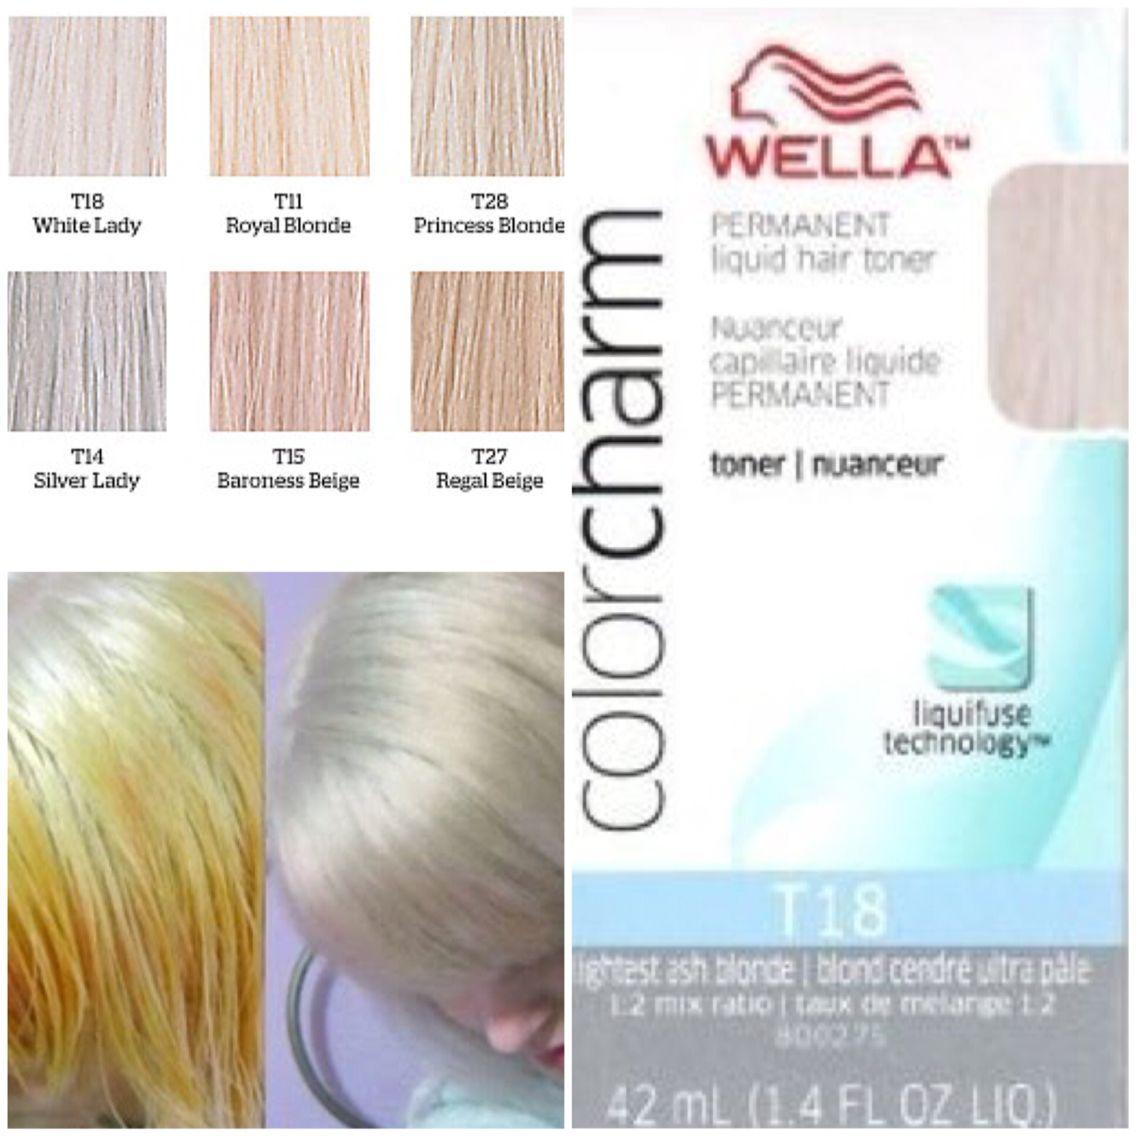 Wella t toner for blondeplatinum hair prelighten the hair with